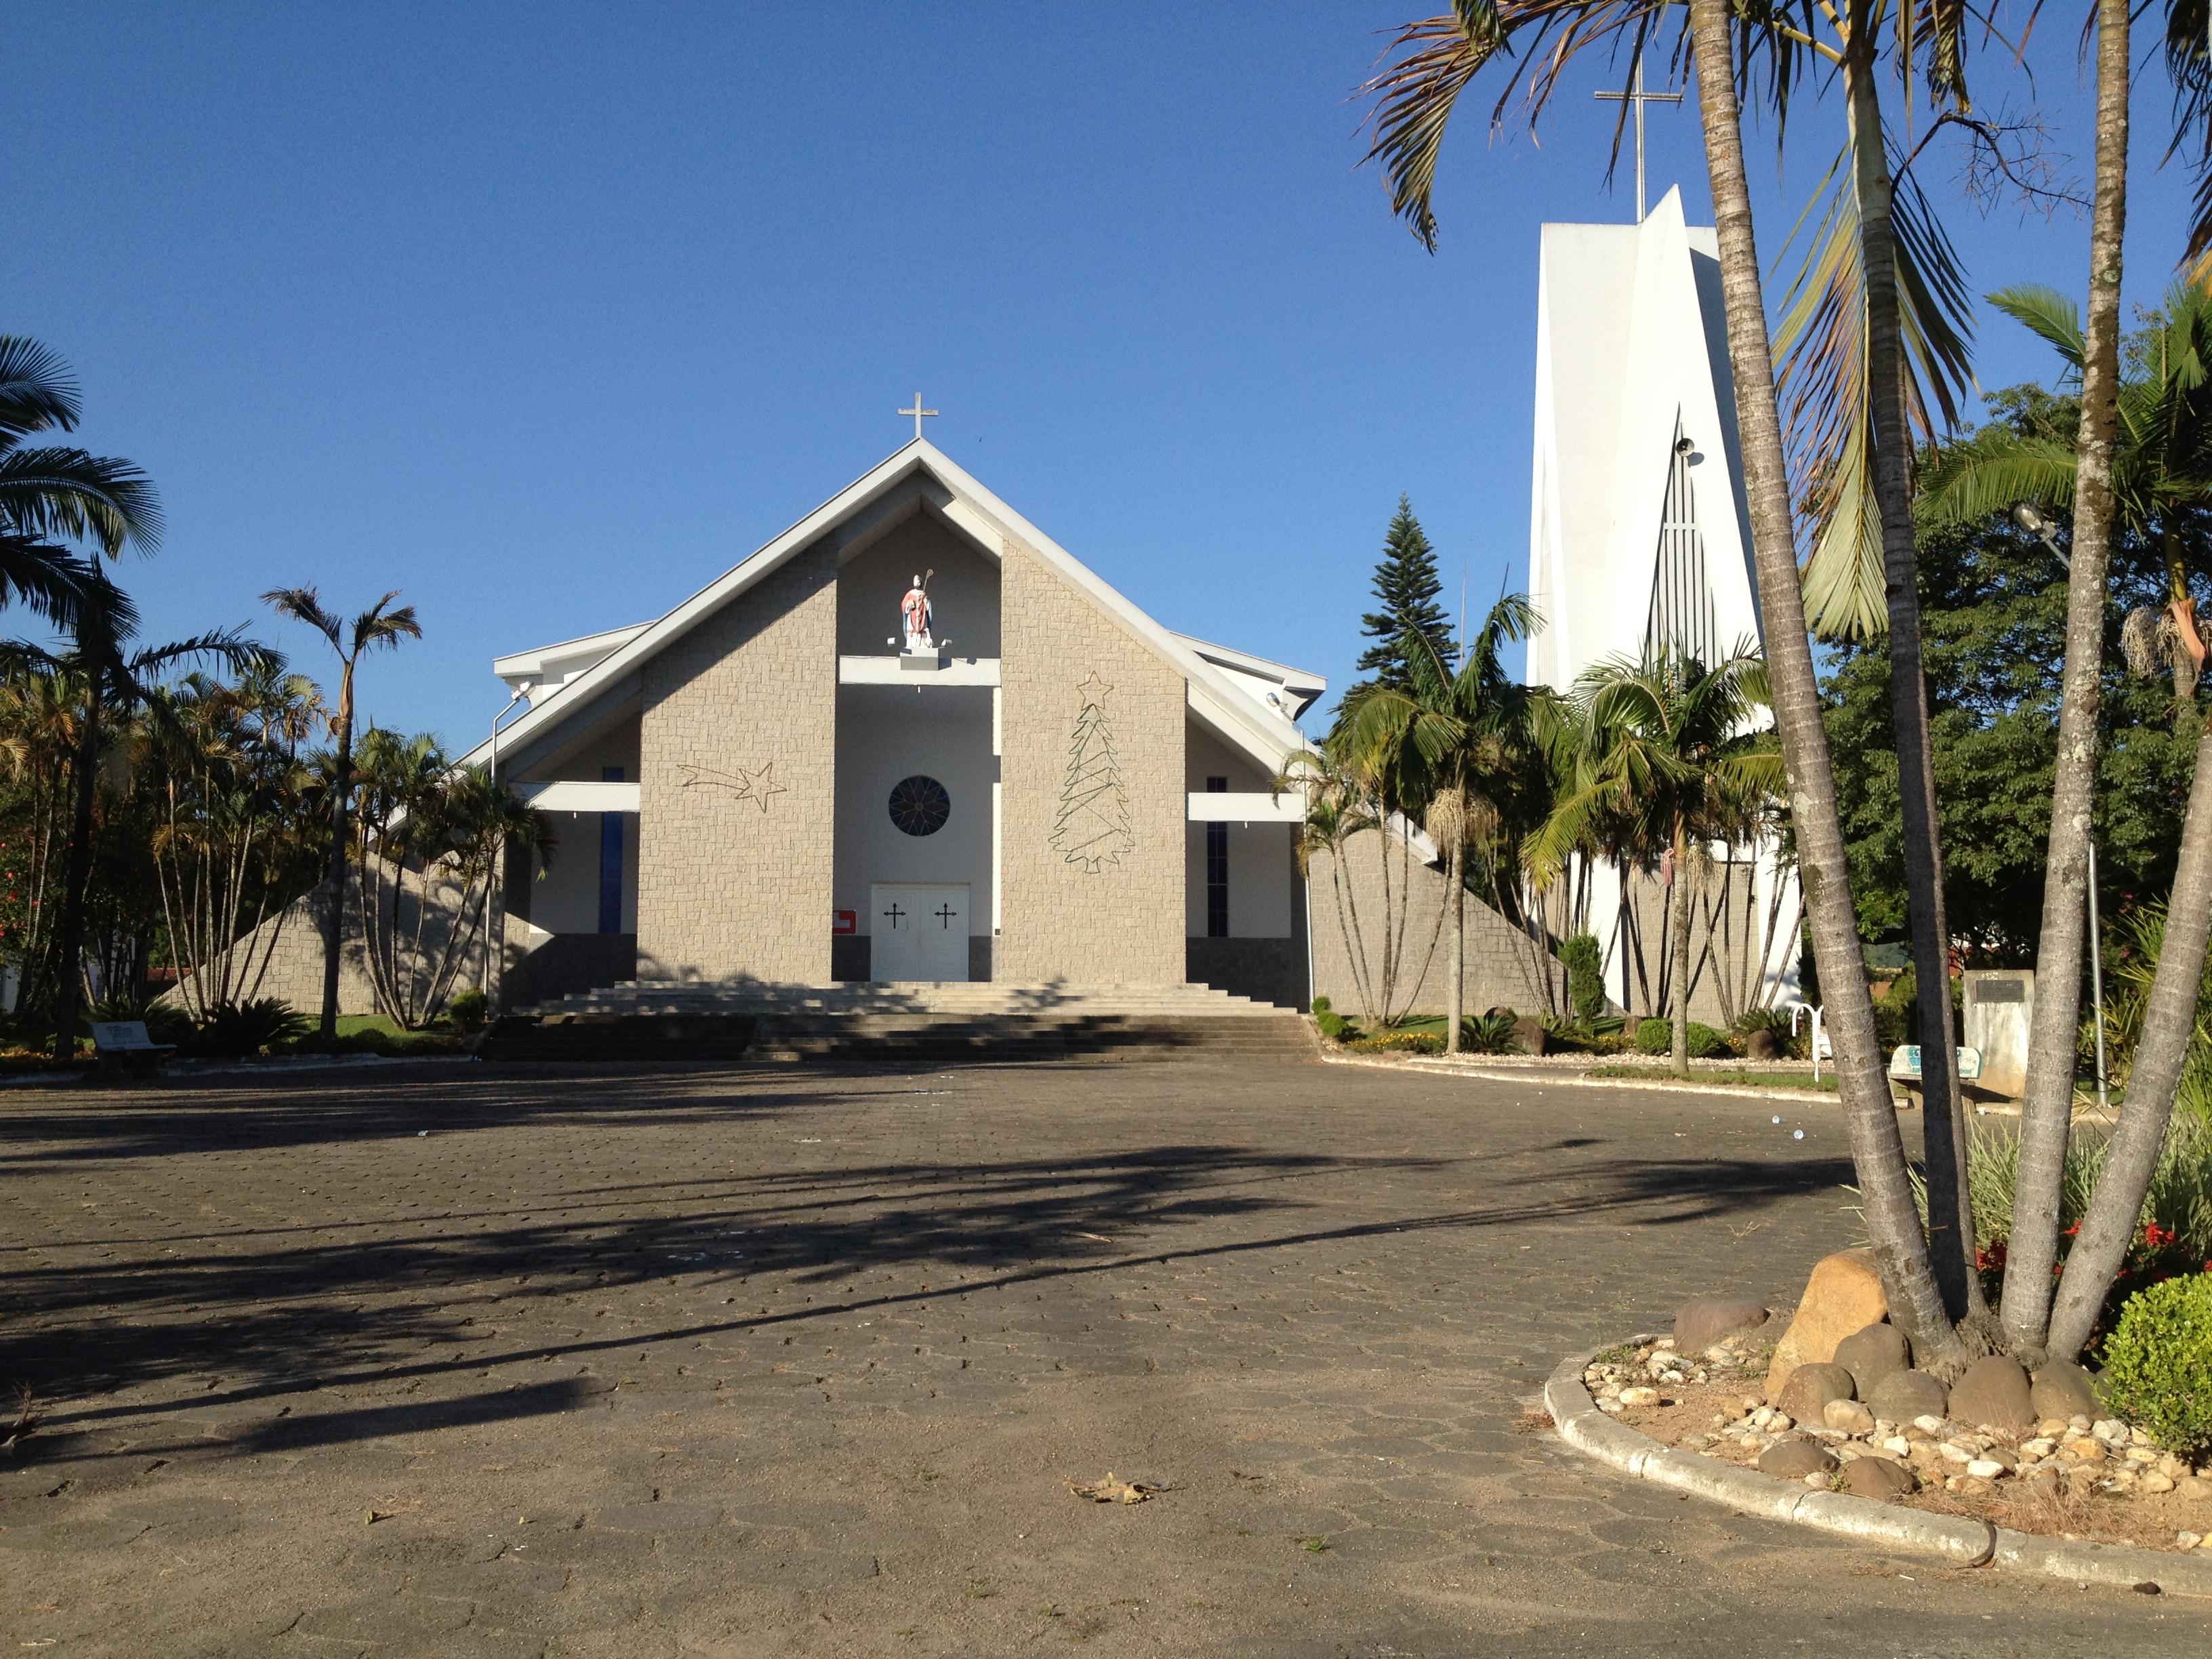 São Ludgero Santa Catarina fonte: upload.wikimedia.org